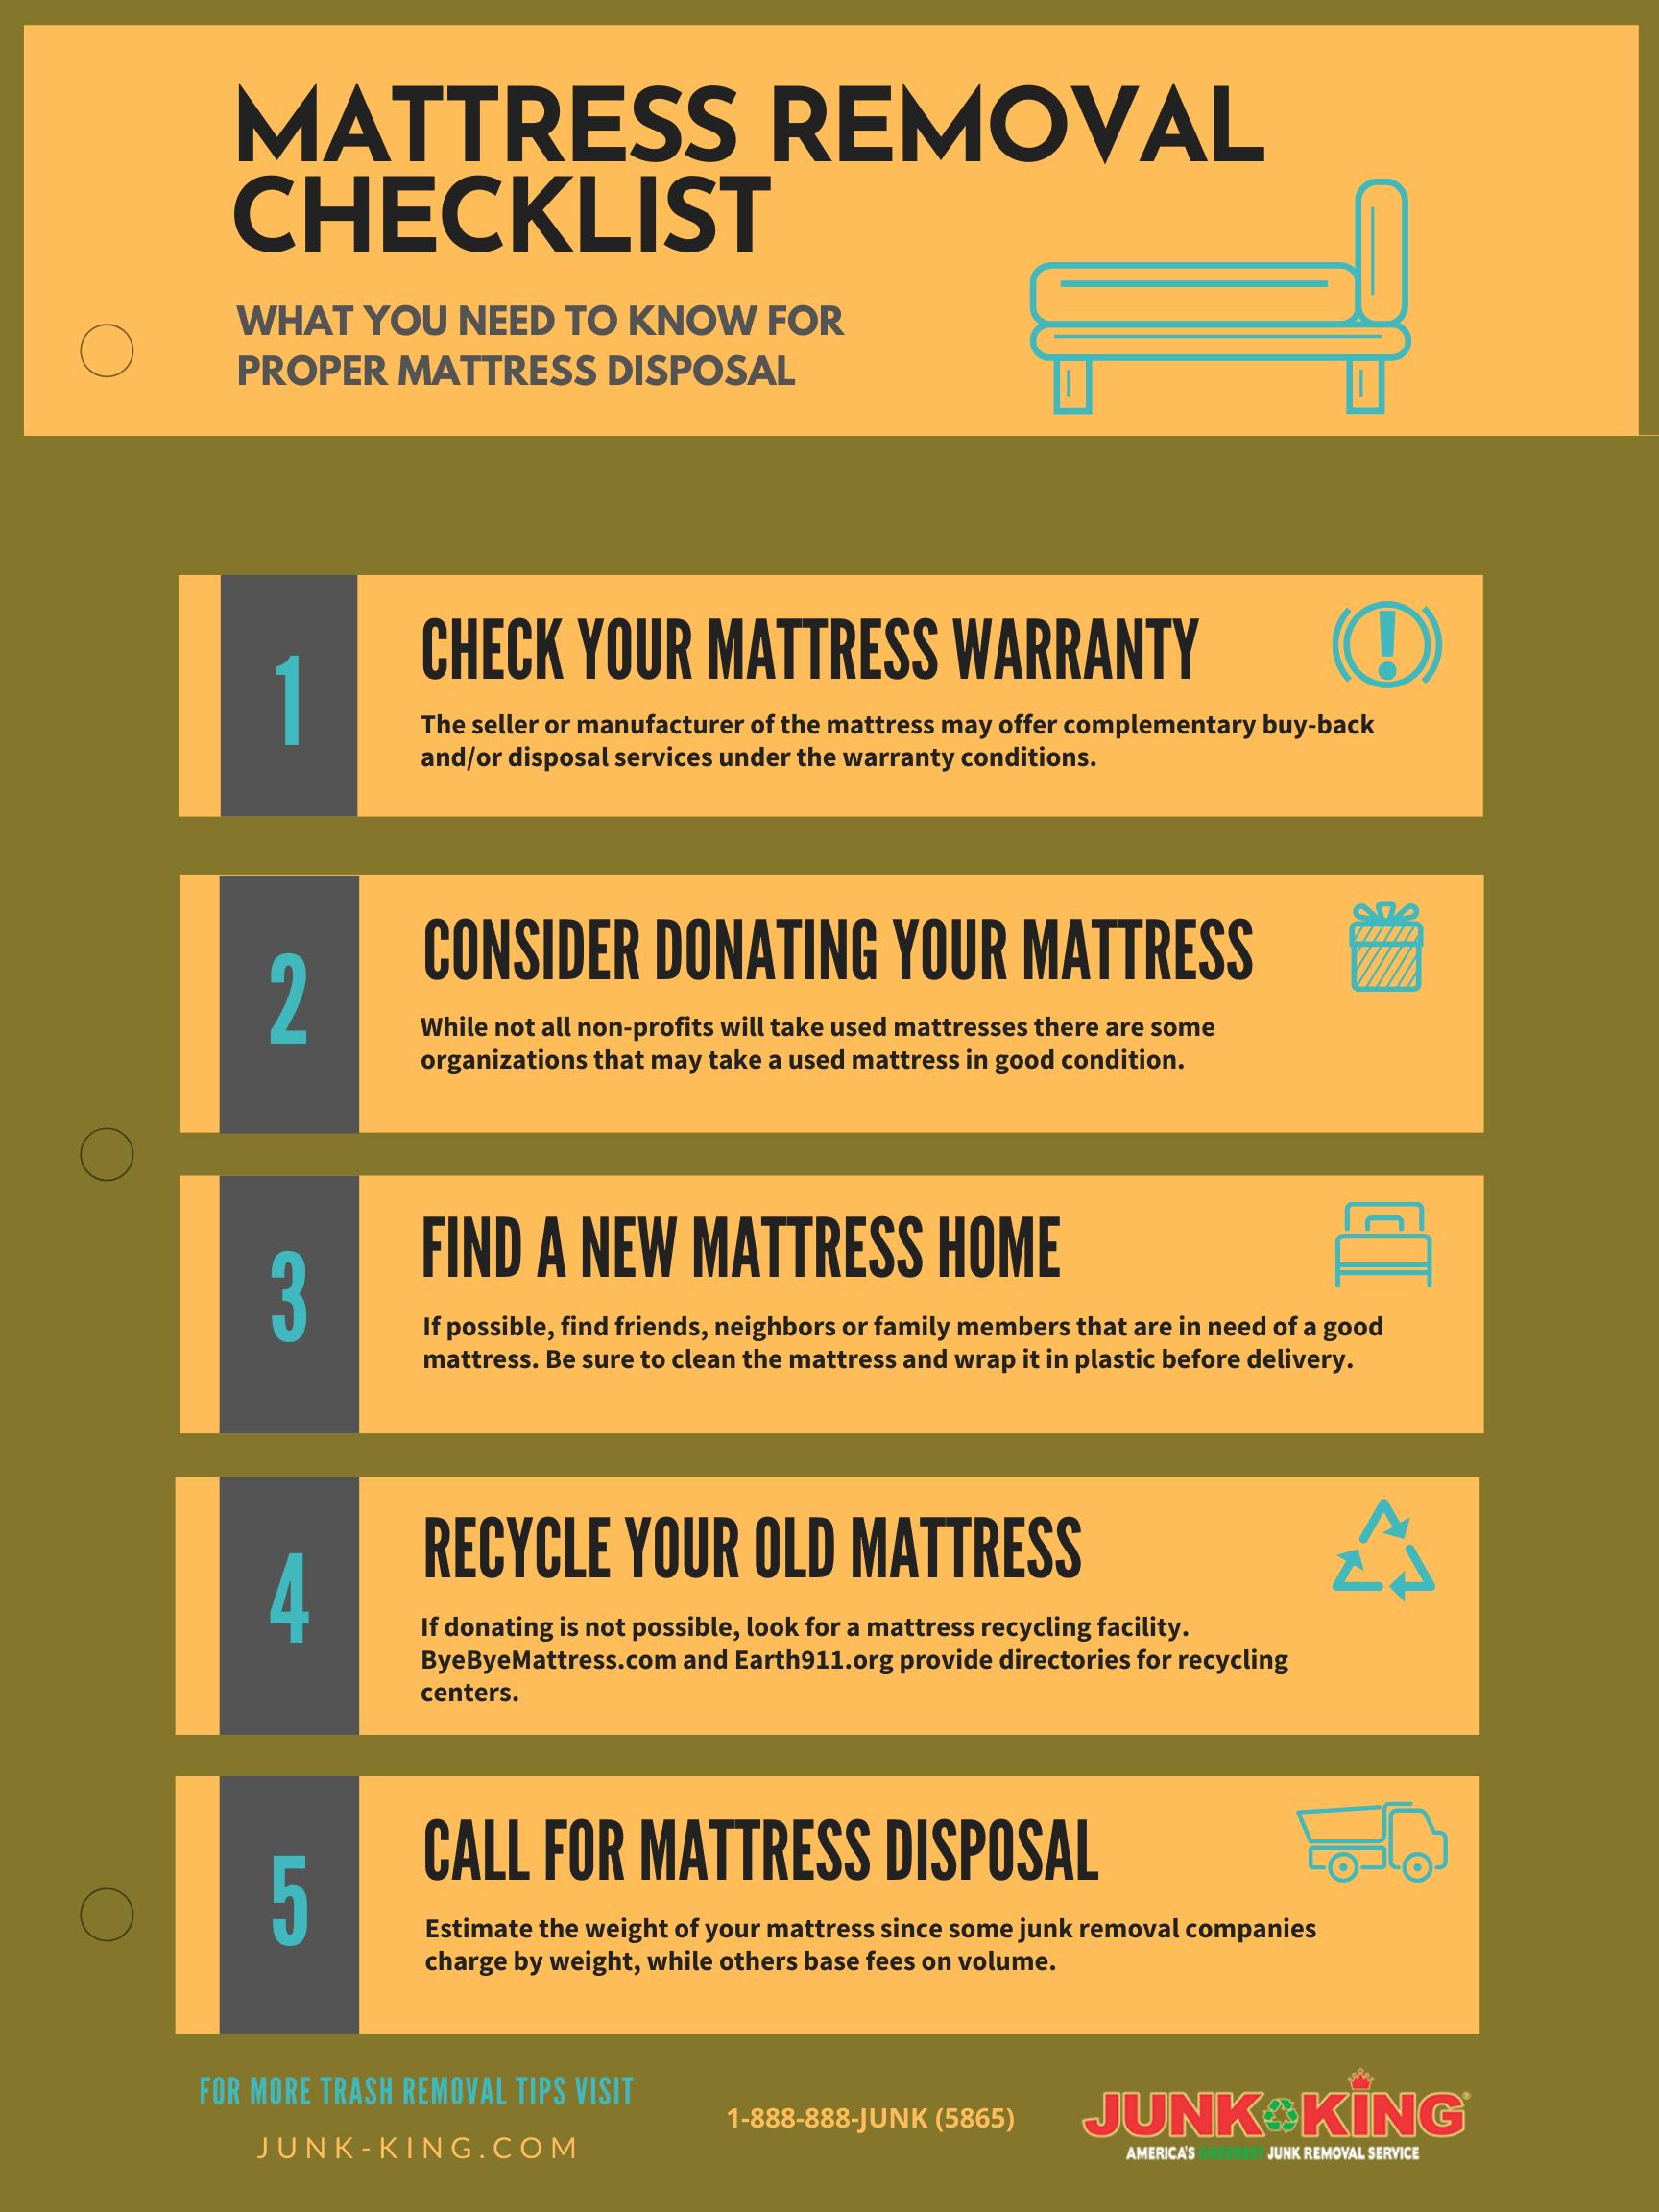 Mattress Removal Checklist